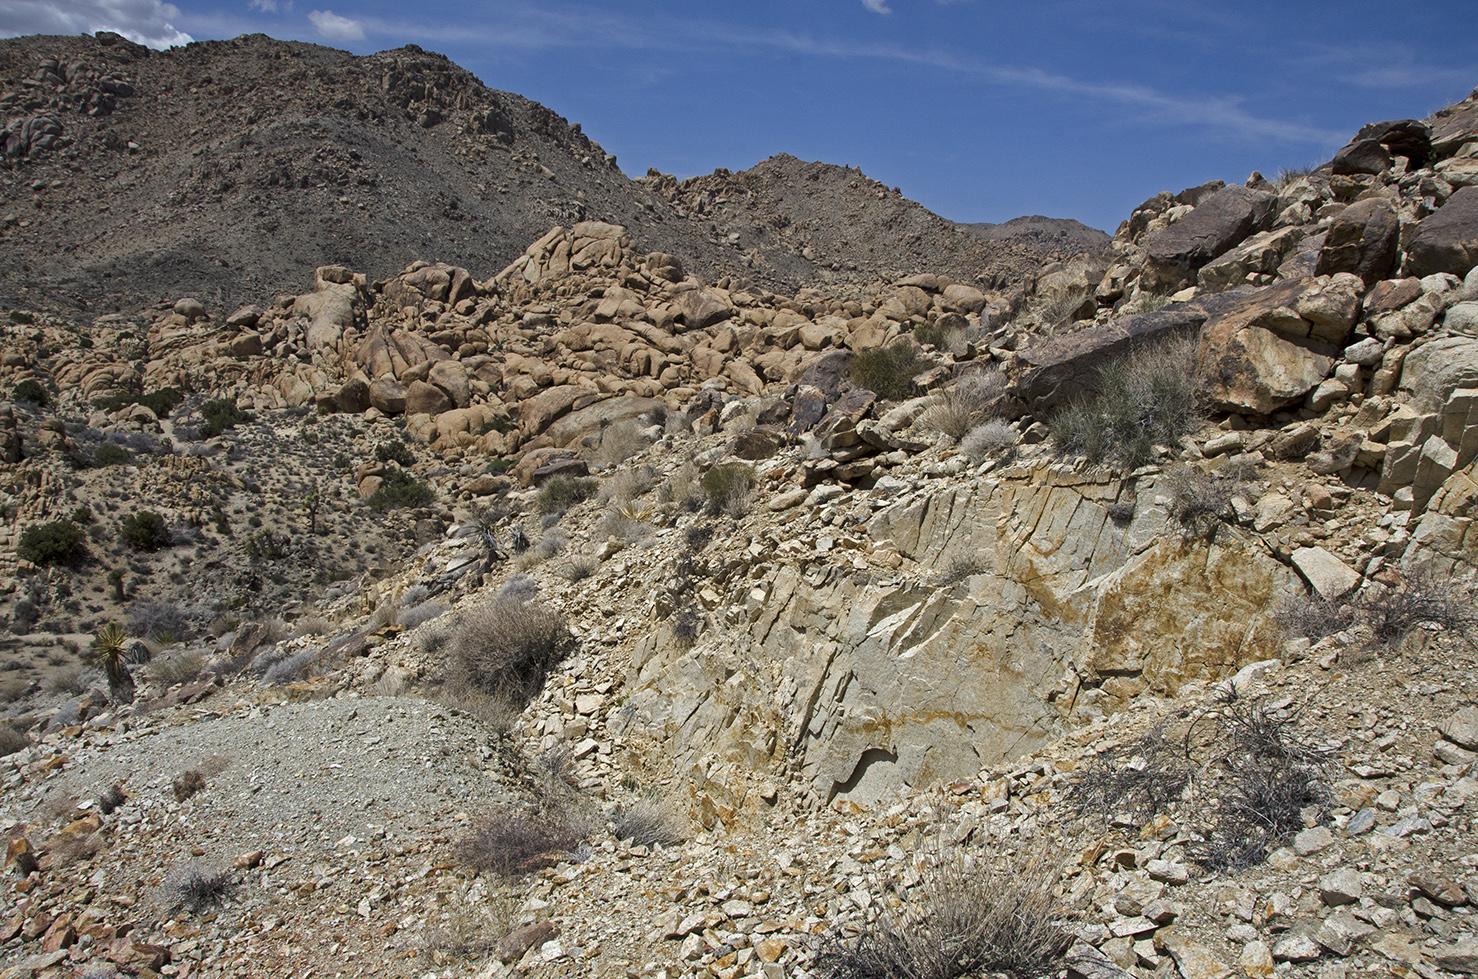 Getting a little closer, still above the mine.